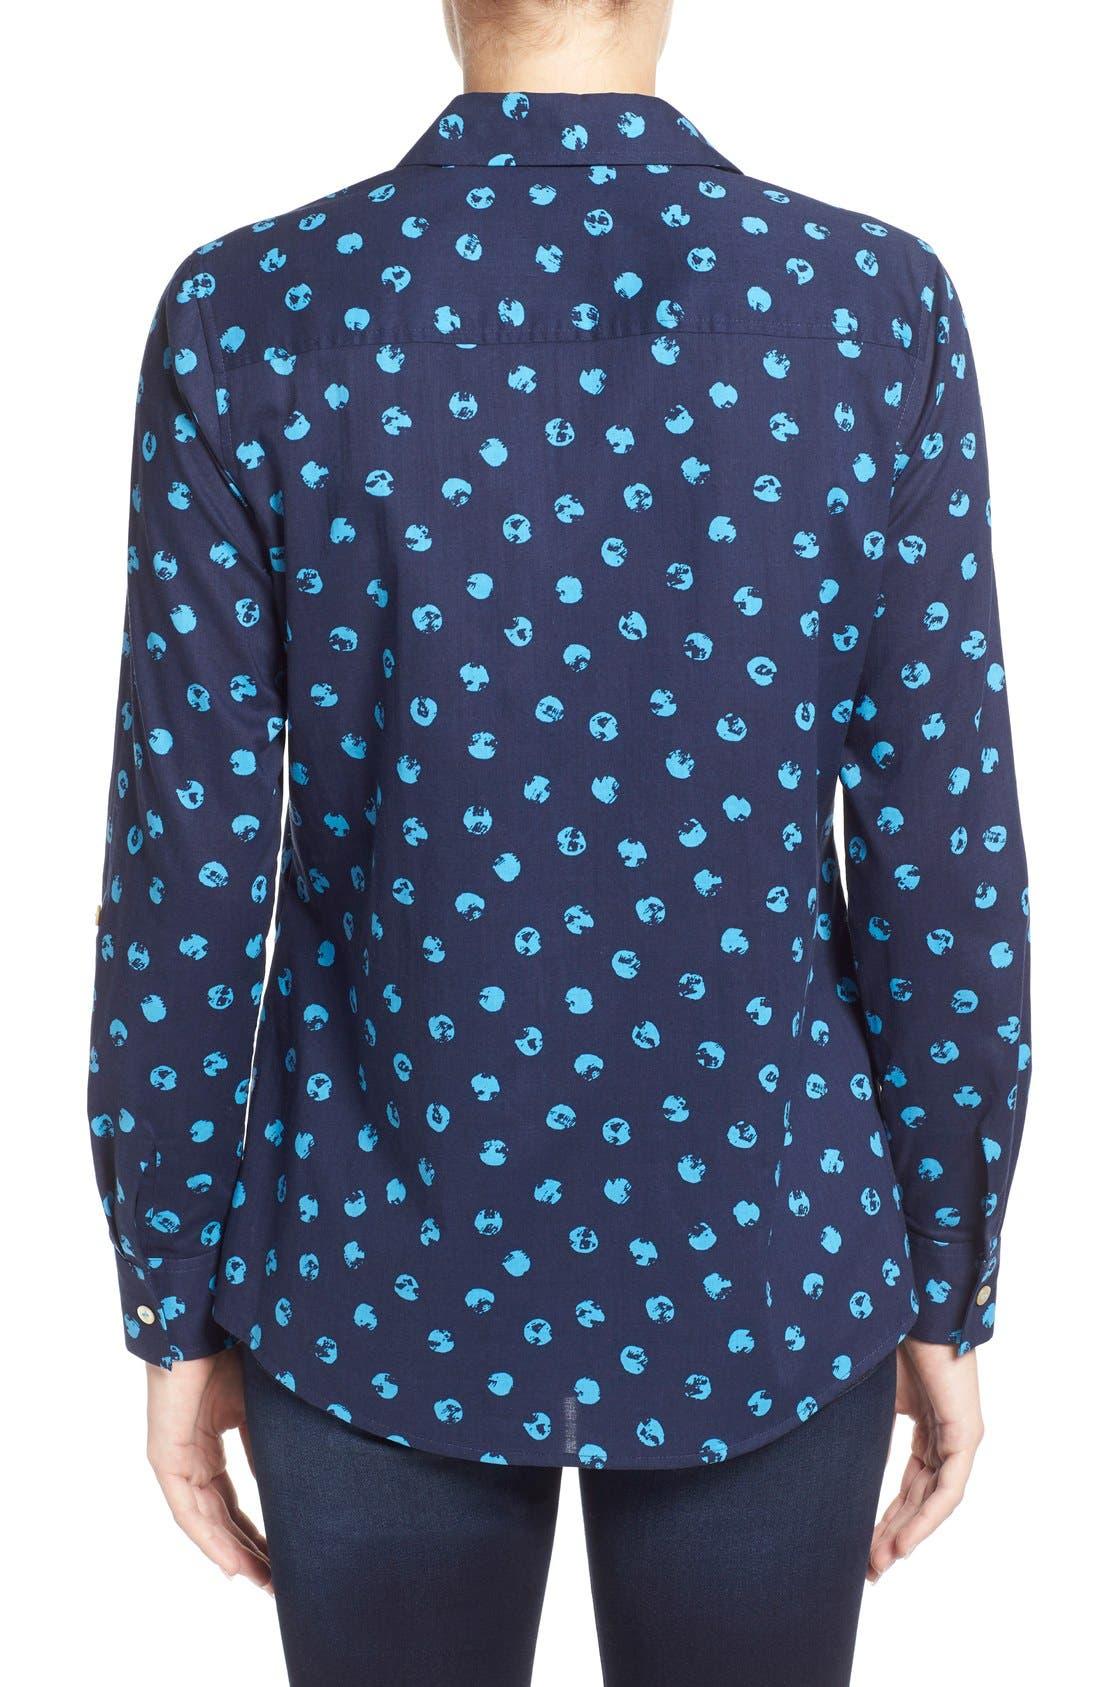 Alternate Image 2  - Foxcroft Distressed Dot Print Roll Sleeve Cotton Shirt (Regular & Petite)